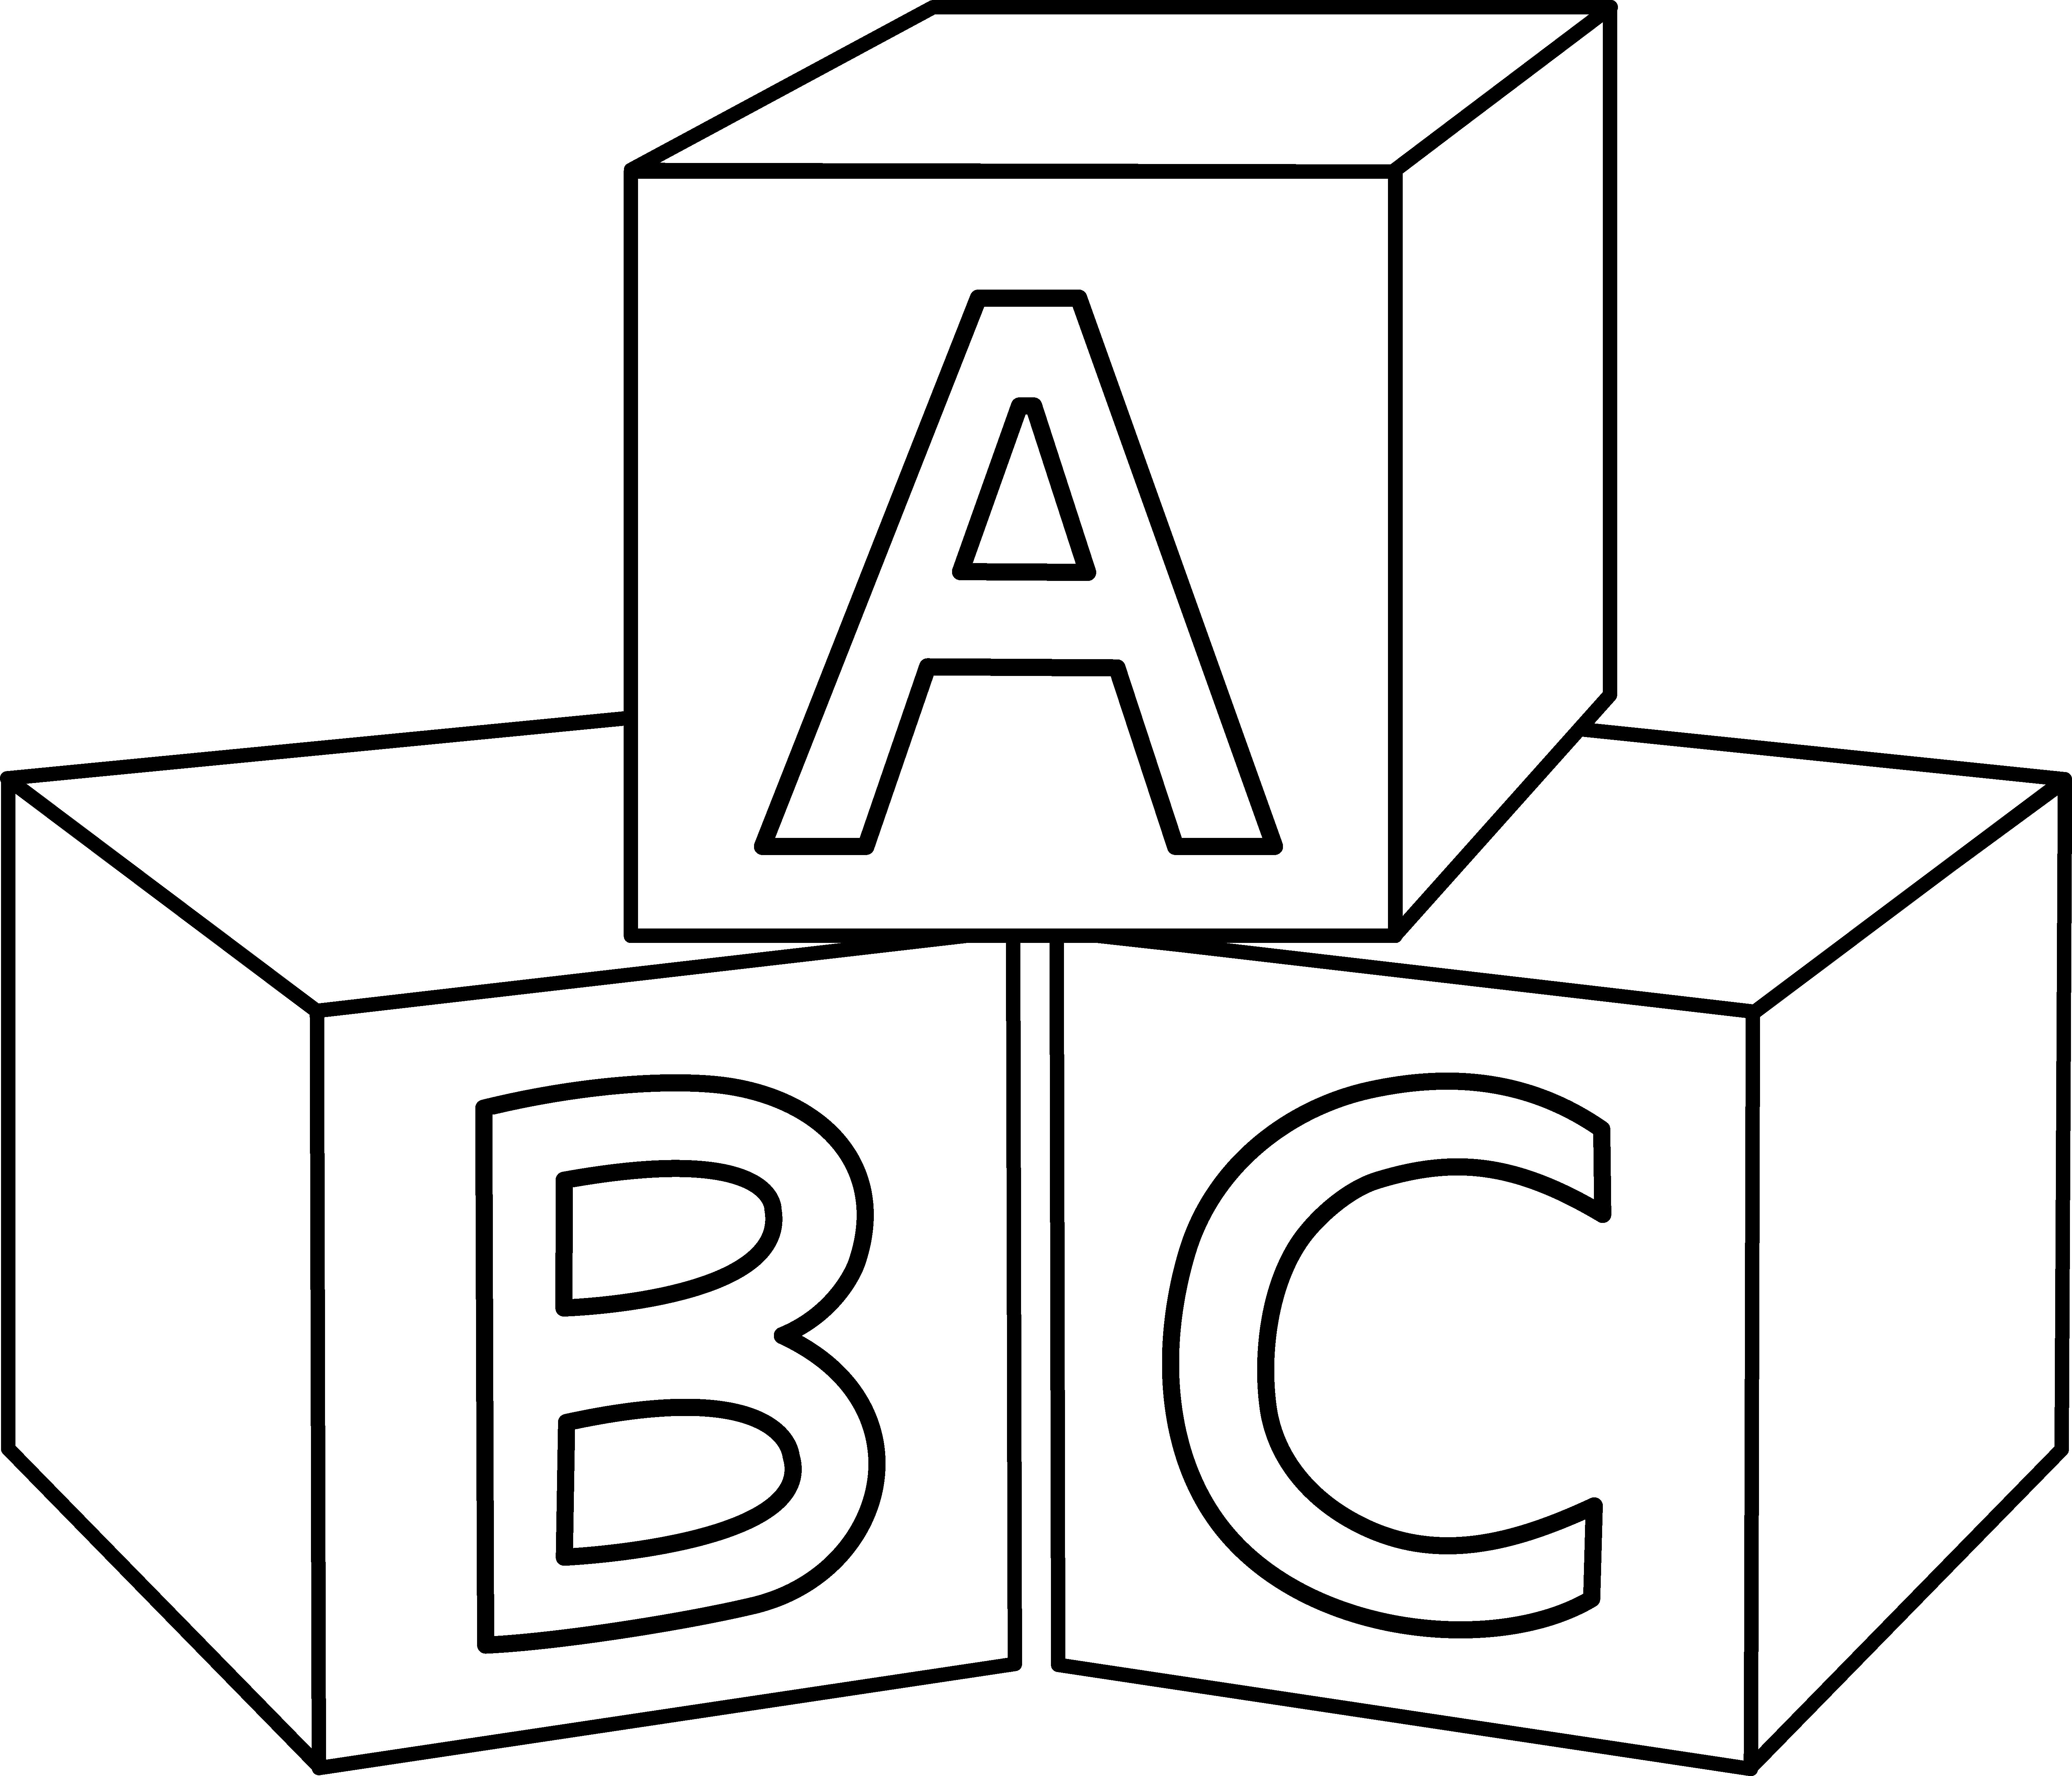 Abc baby blocks clipart png transparent stock ABC Blocks Design | mirror image transfer | Alphabet blocks, Baby ... png transparent stock